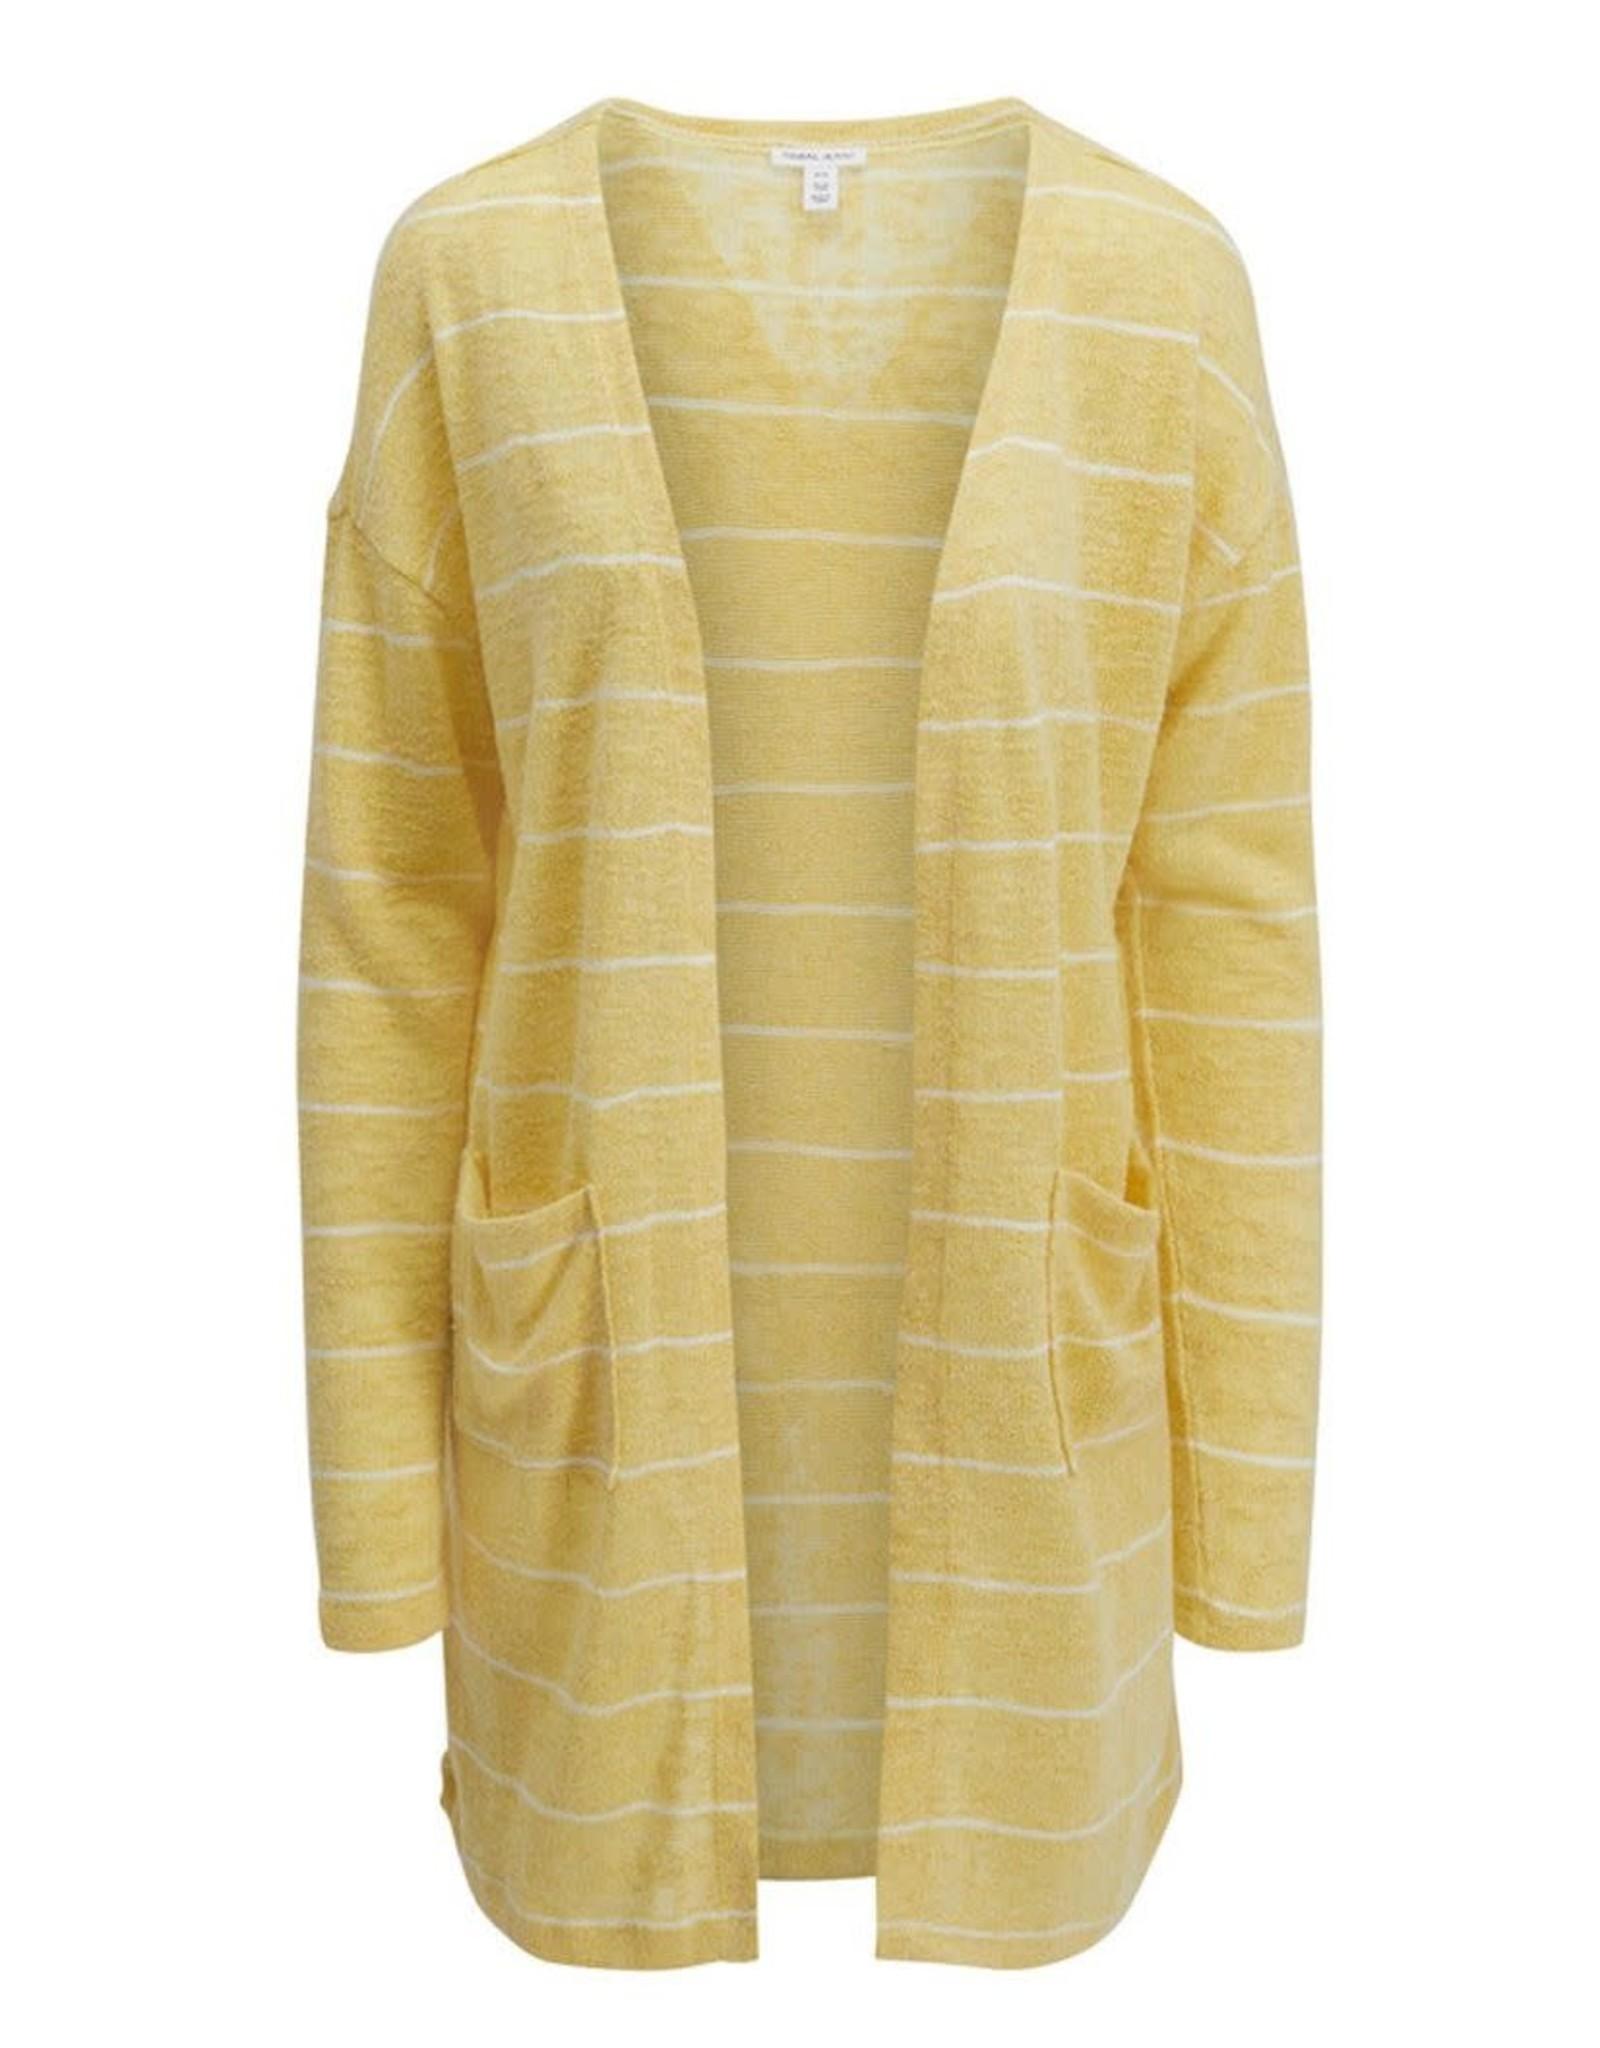 Tribal Yellow Striped Knit Cardigan